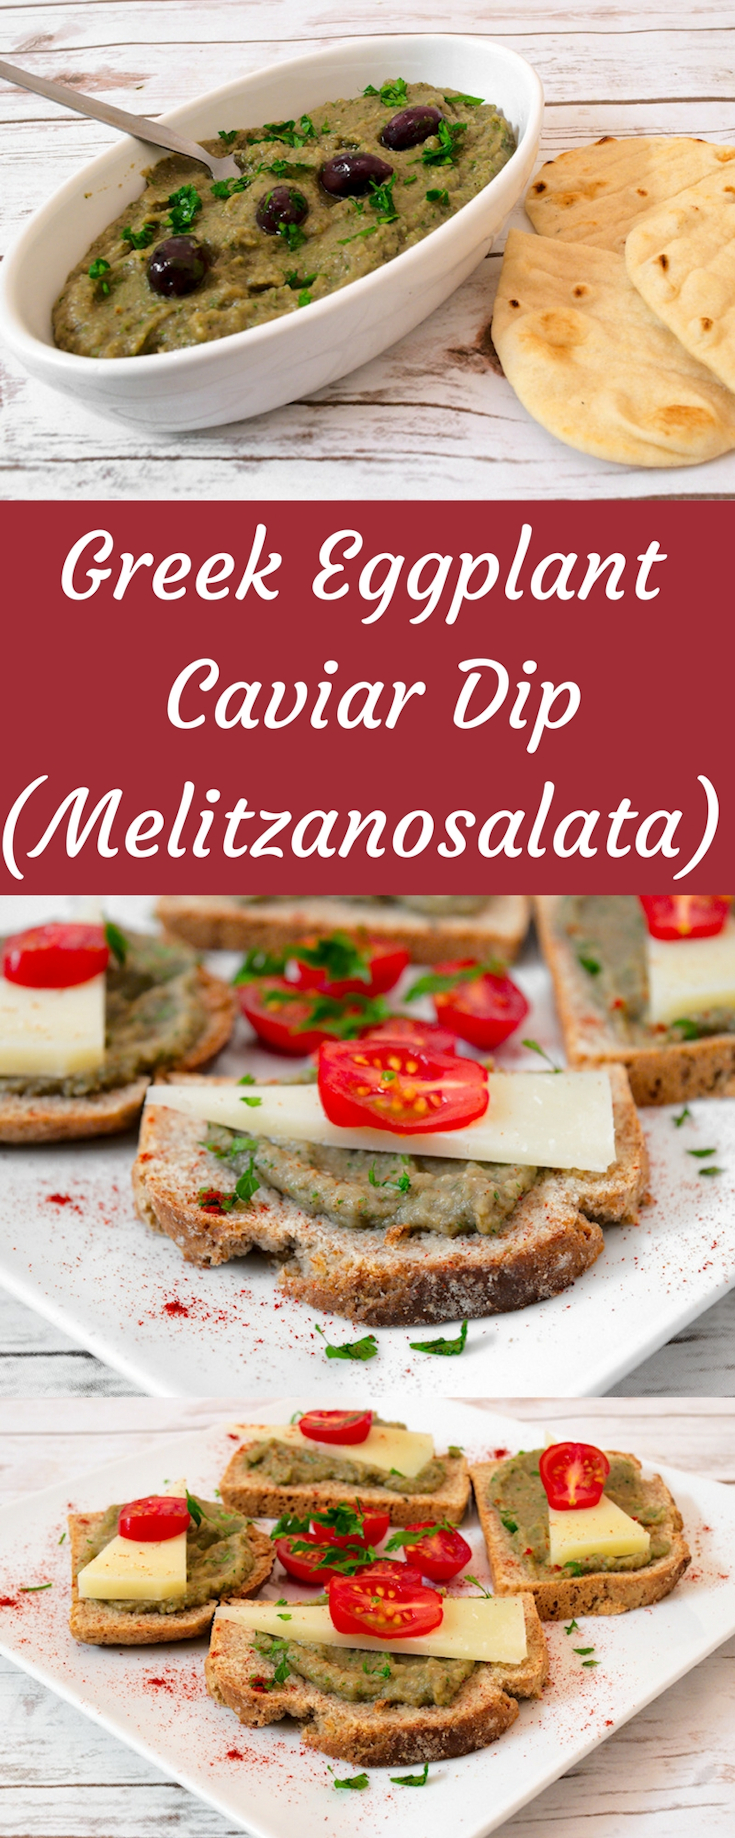 Greek Eggplant Caviar Dip (Melitzanosalata)